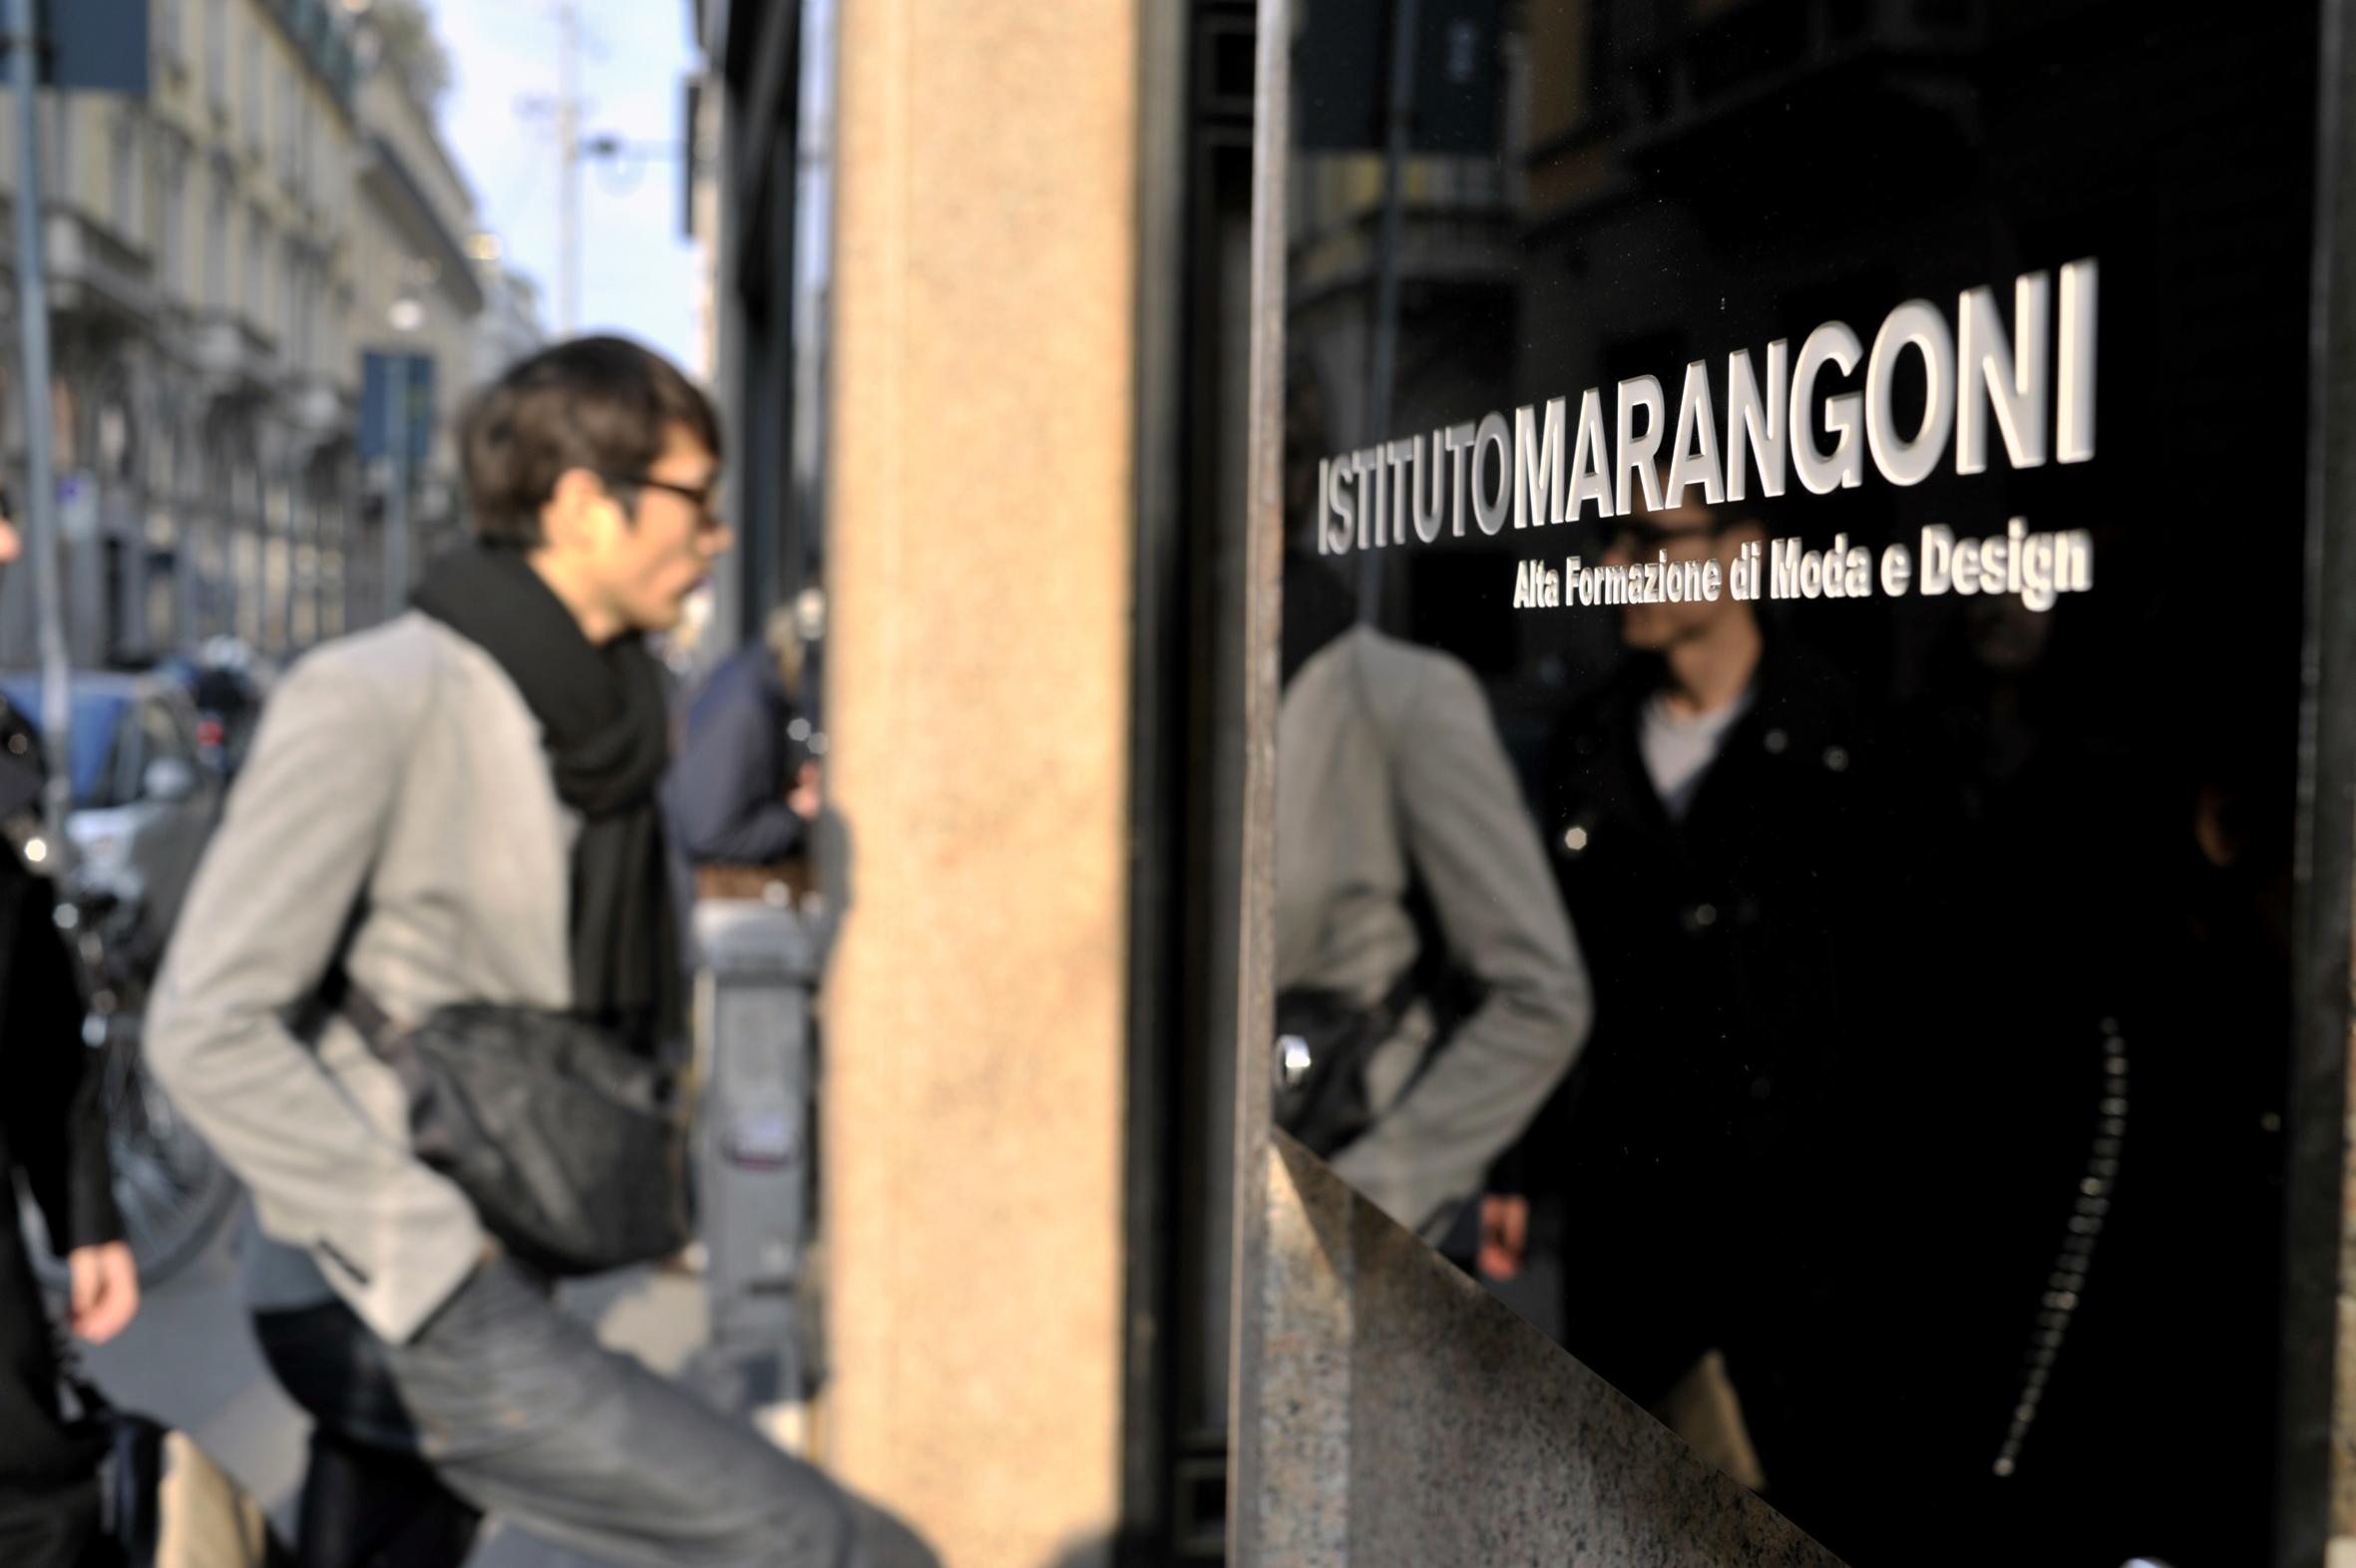 Sekolah Fashion Istituto Marangoni